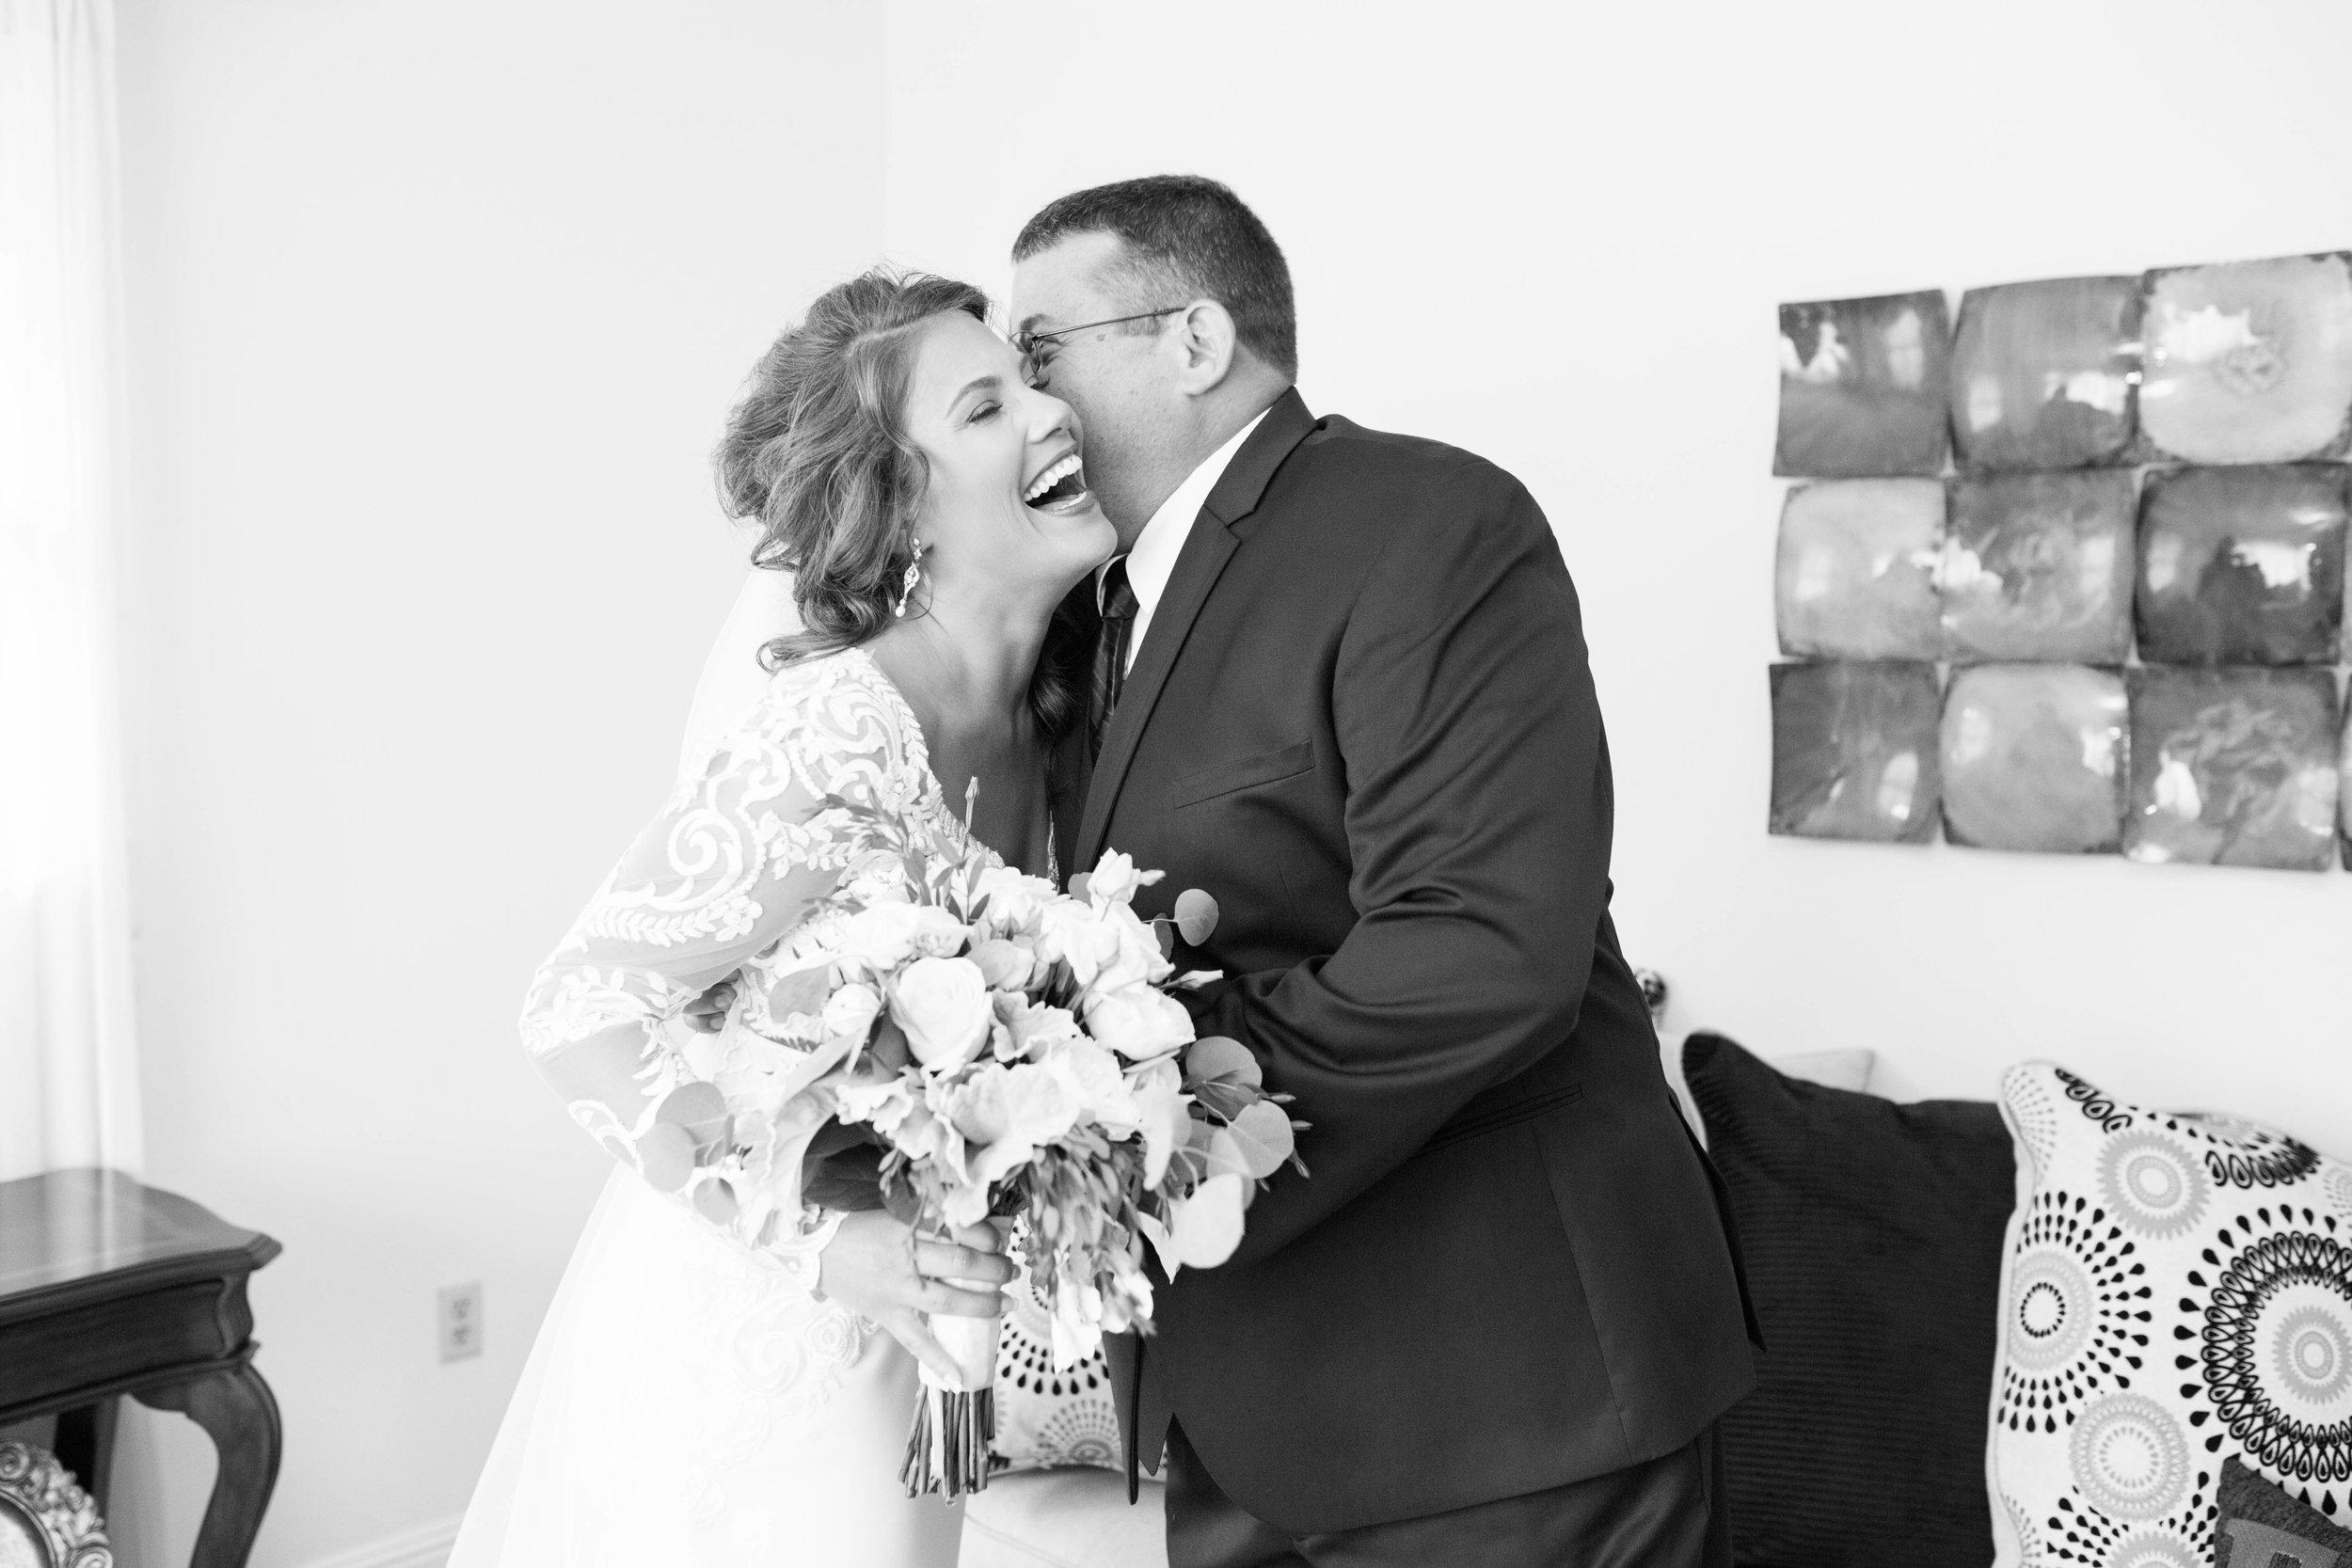 Burns_Wedding_the_old_post_office_Kara_Blakeman_Photography_2018_Huntington_West_Virginia-4814.jpg